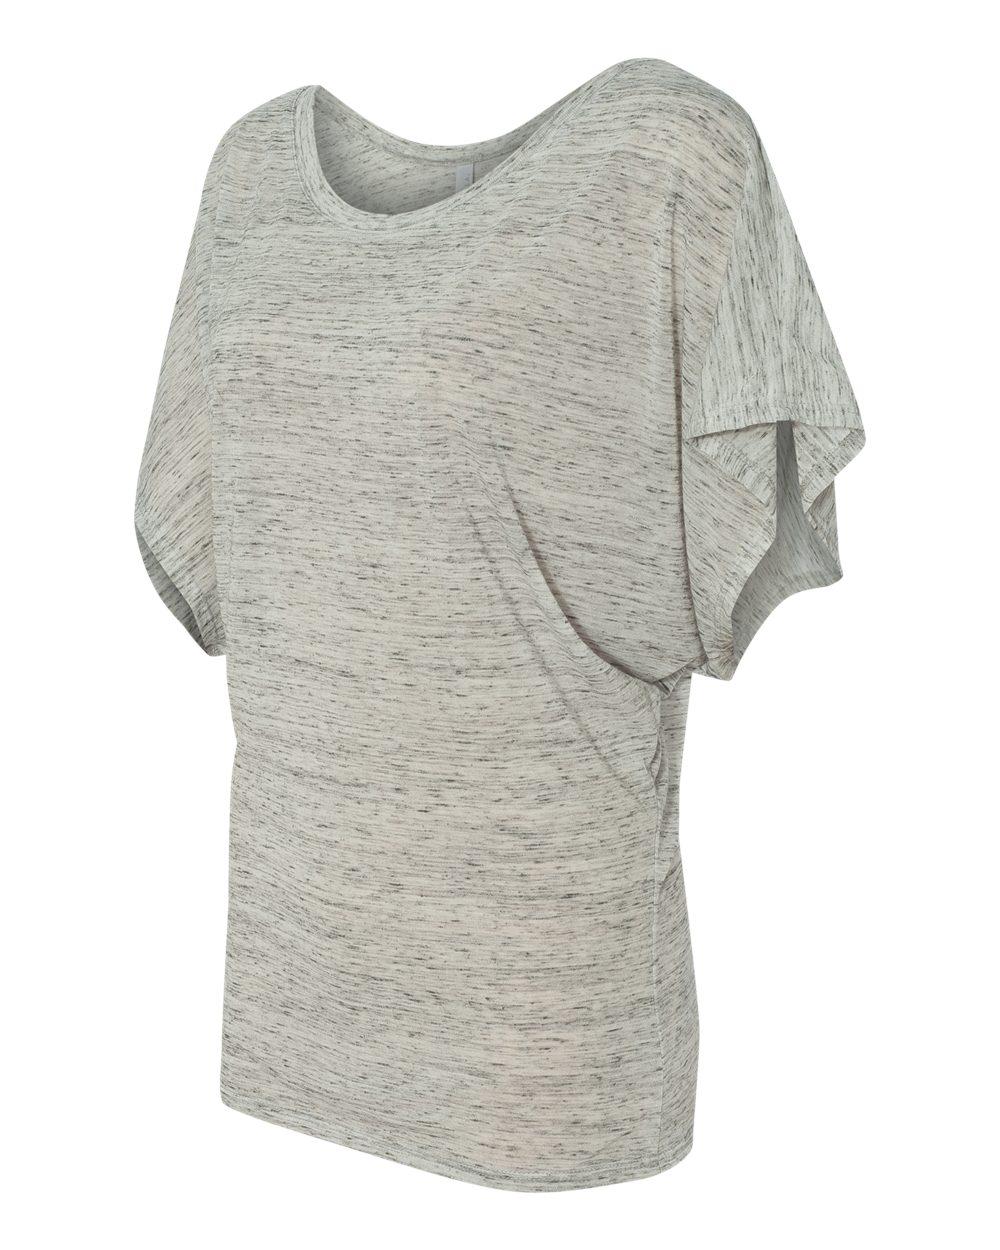 Bella-Canvas-Women-039-s-Flowy-Draped-Sleeve-Dolman-T-Shirt-8821-S-2XL thumbnail 9